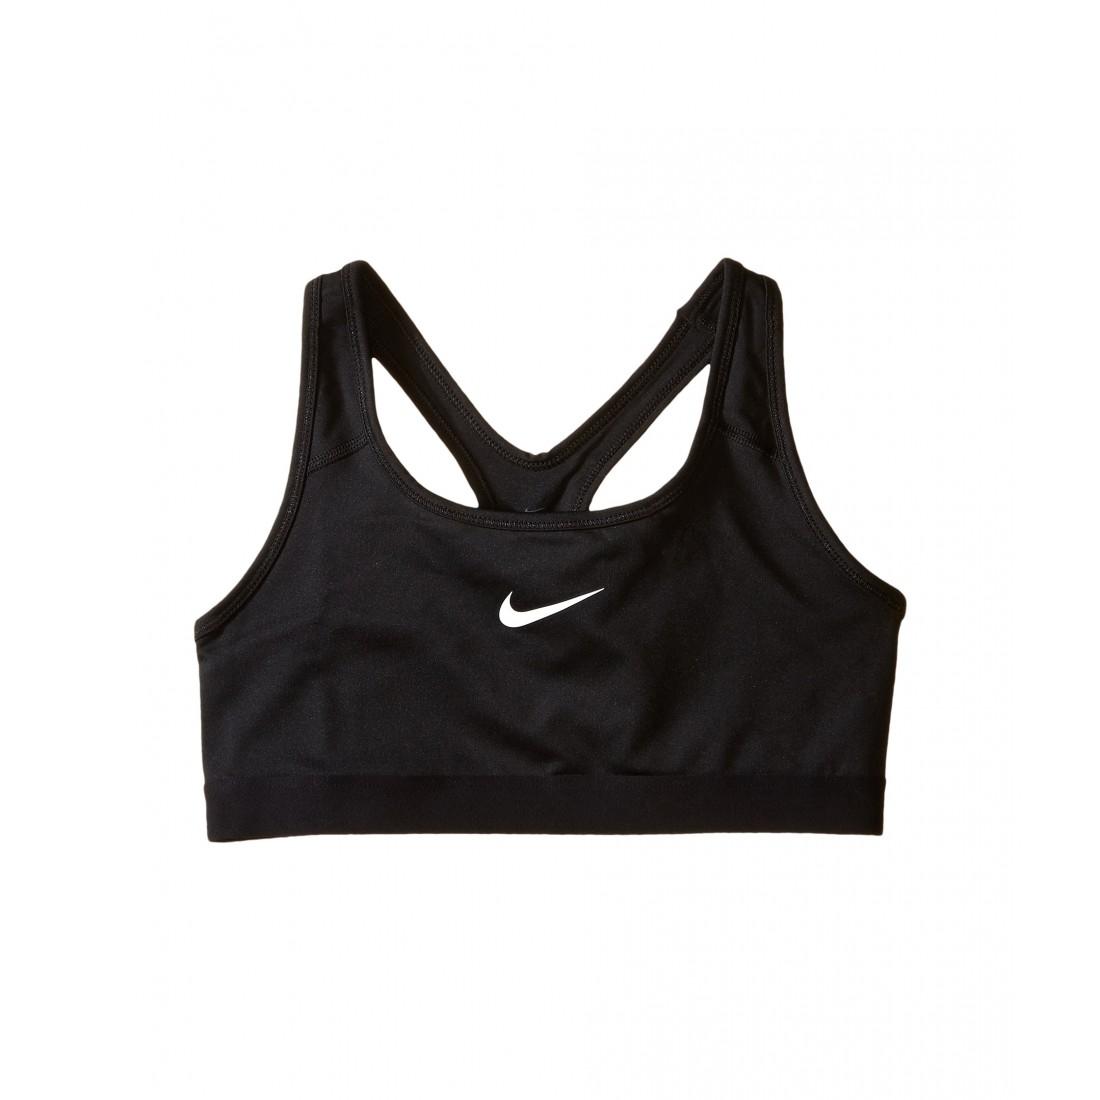 Nike Kids Pro Medium Support Sports Bra (Little Kids Big Kids) ZPSKU 8723044 541a3ef8e89e